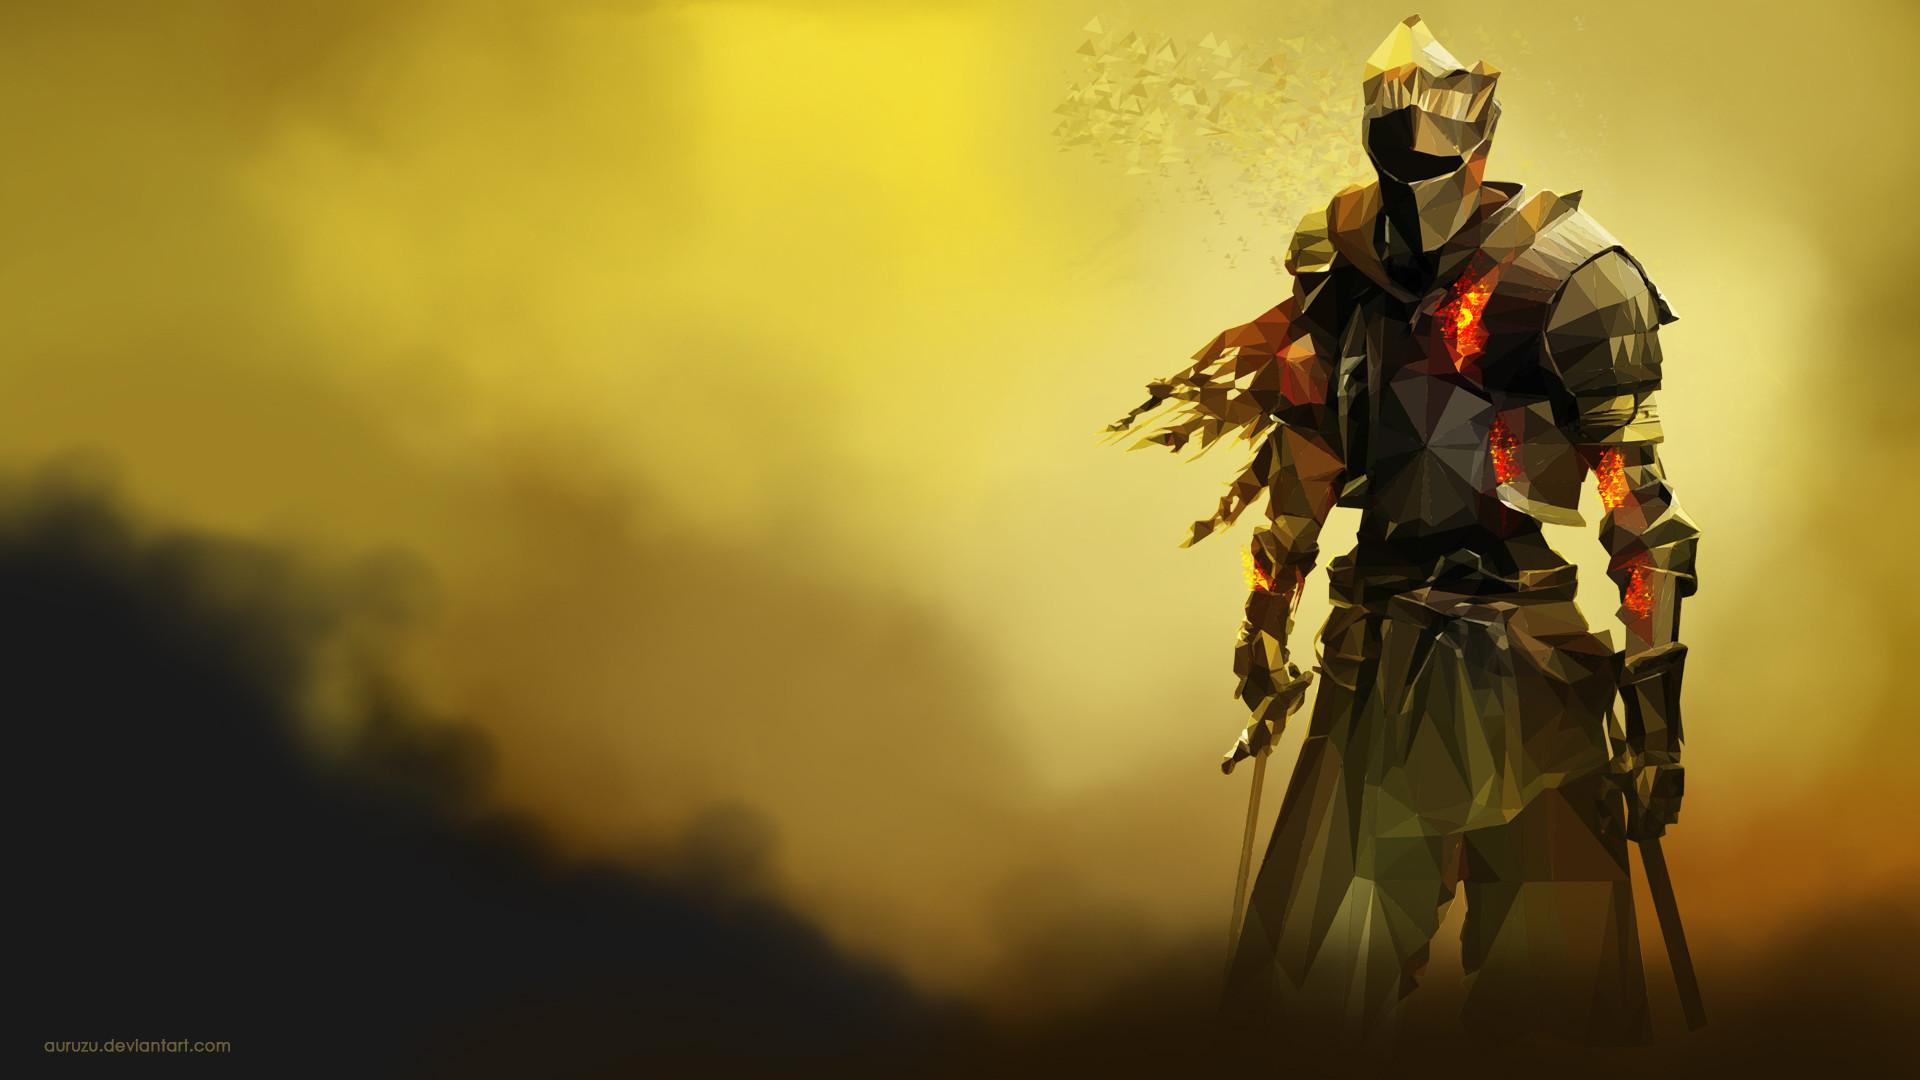 … Dark Souls 3 Polygon Wallpaper by Auruzu